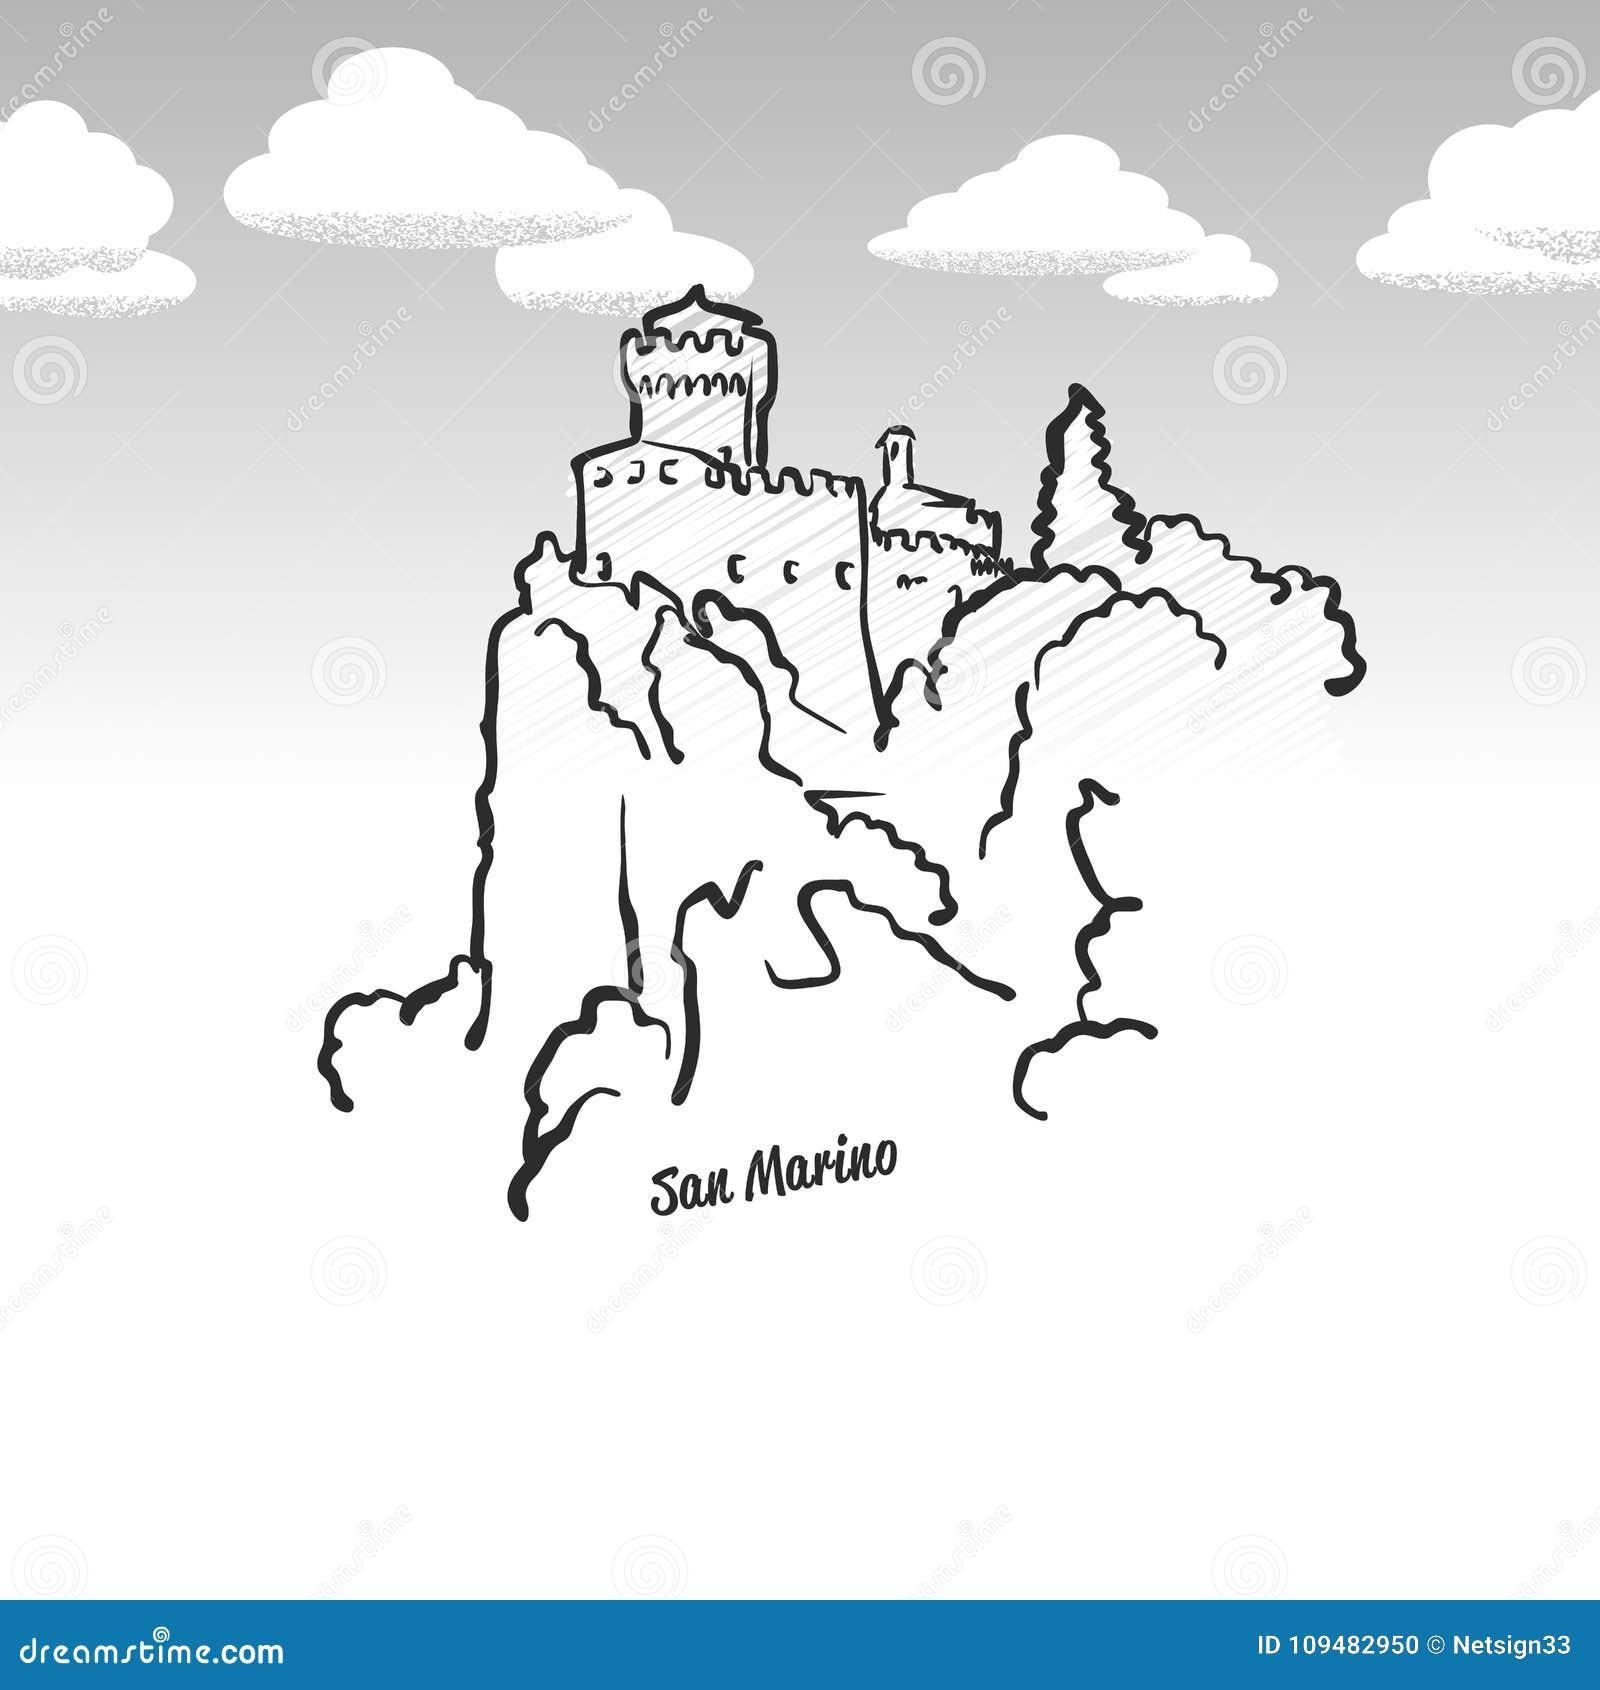 San Marino Famous Landmark Sketch Stock Vector Illustration Of